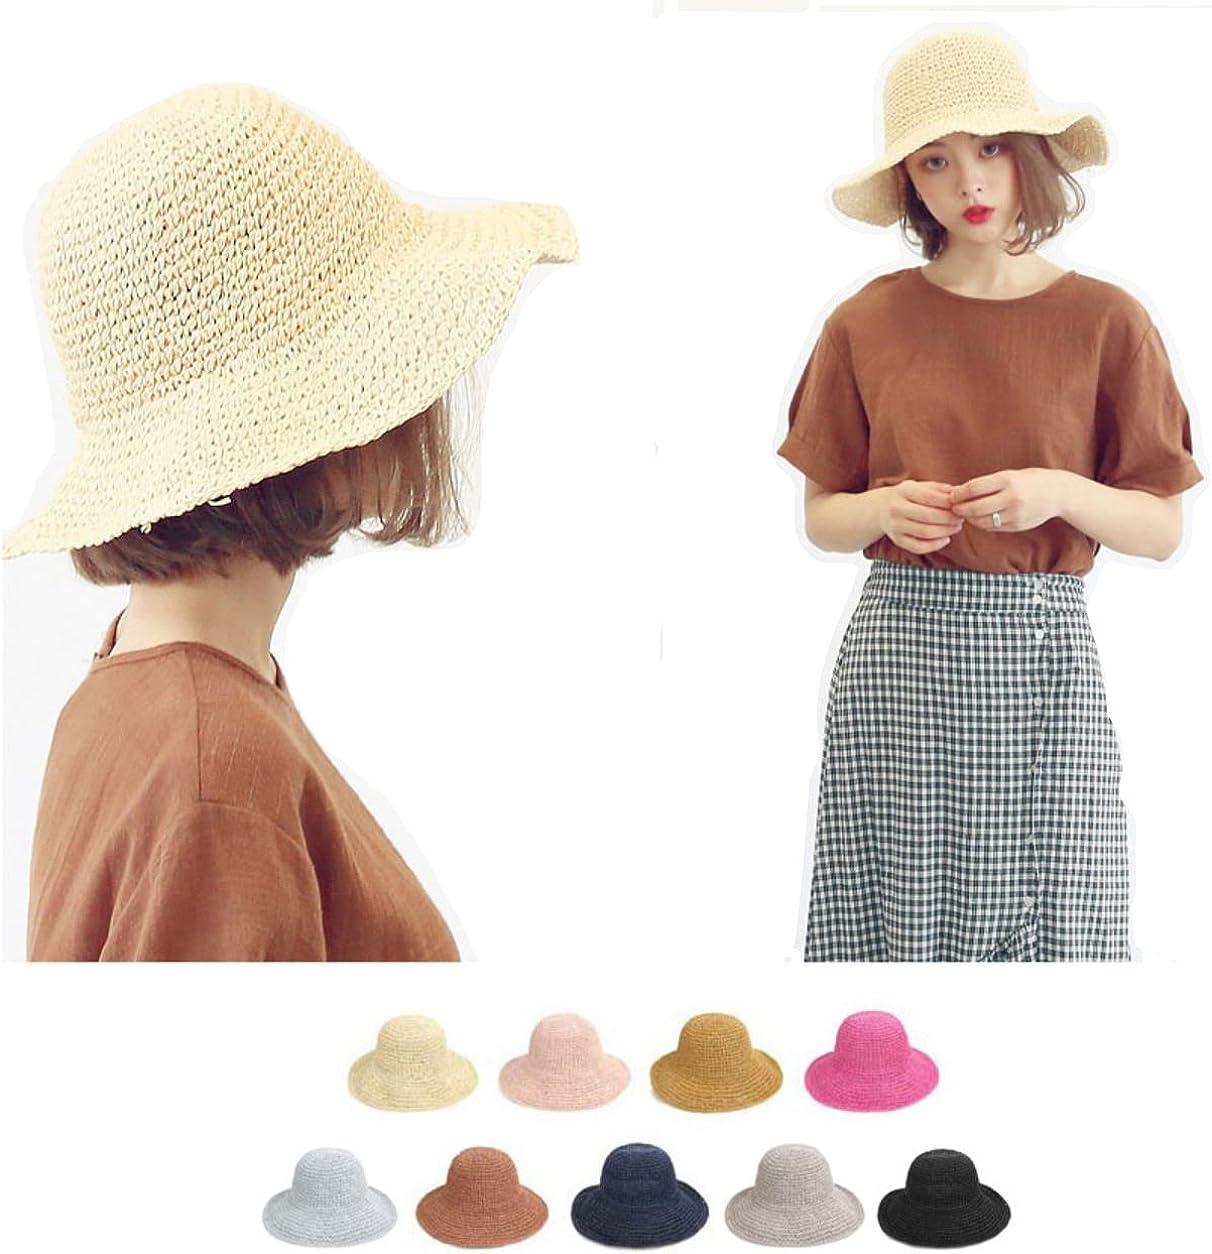 Sassy Pippi 【Korean Style】 Straw Hat Bucket Hat/Straw Panama Hat/Panama Cap/Straw Fedora Hat